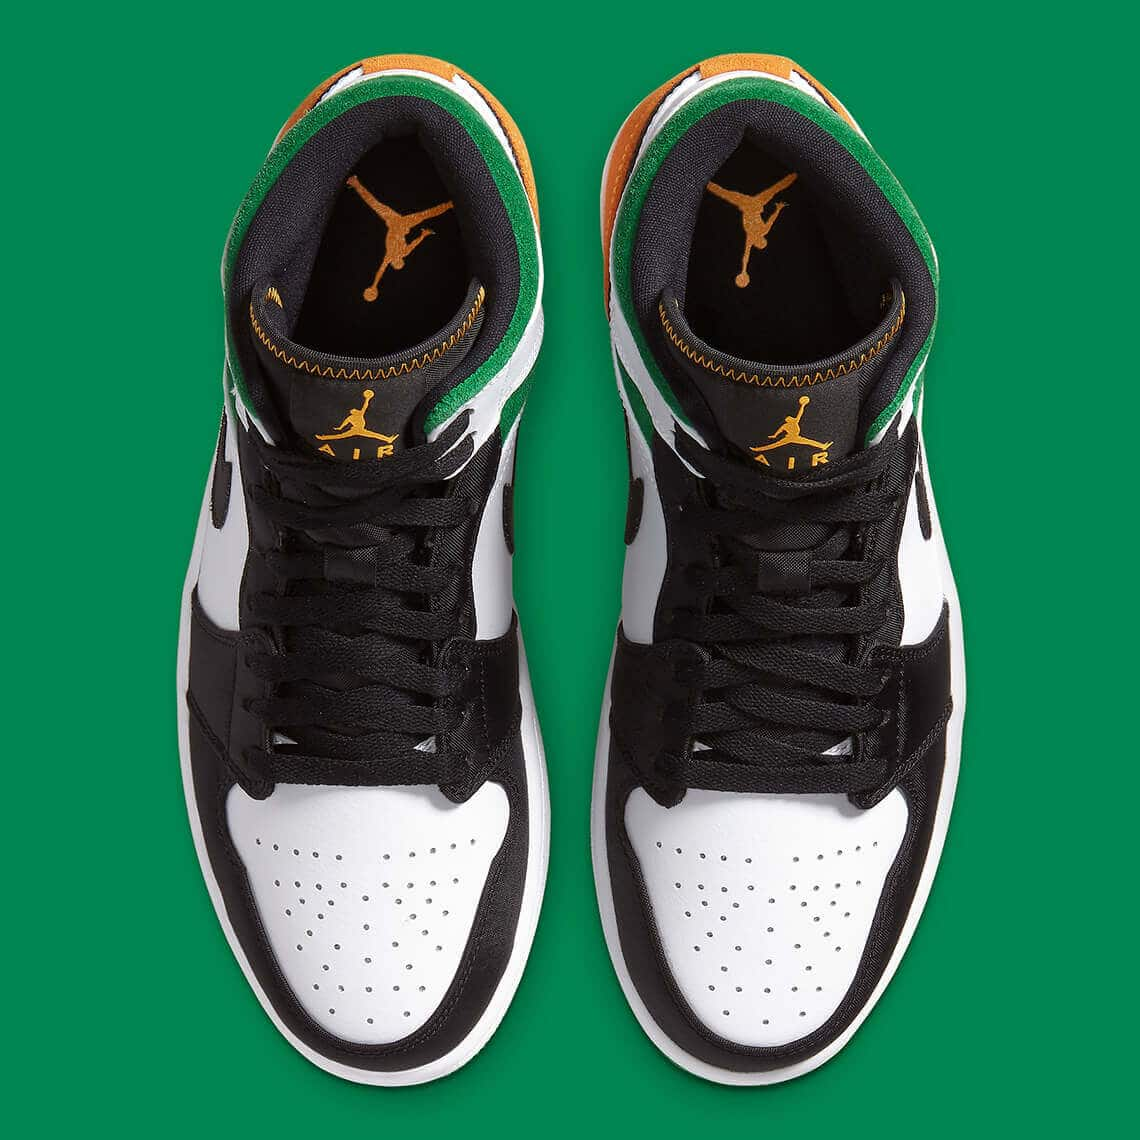 Air Jordan 1 Mid Oakland 852542 101 Release Info 4 1